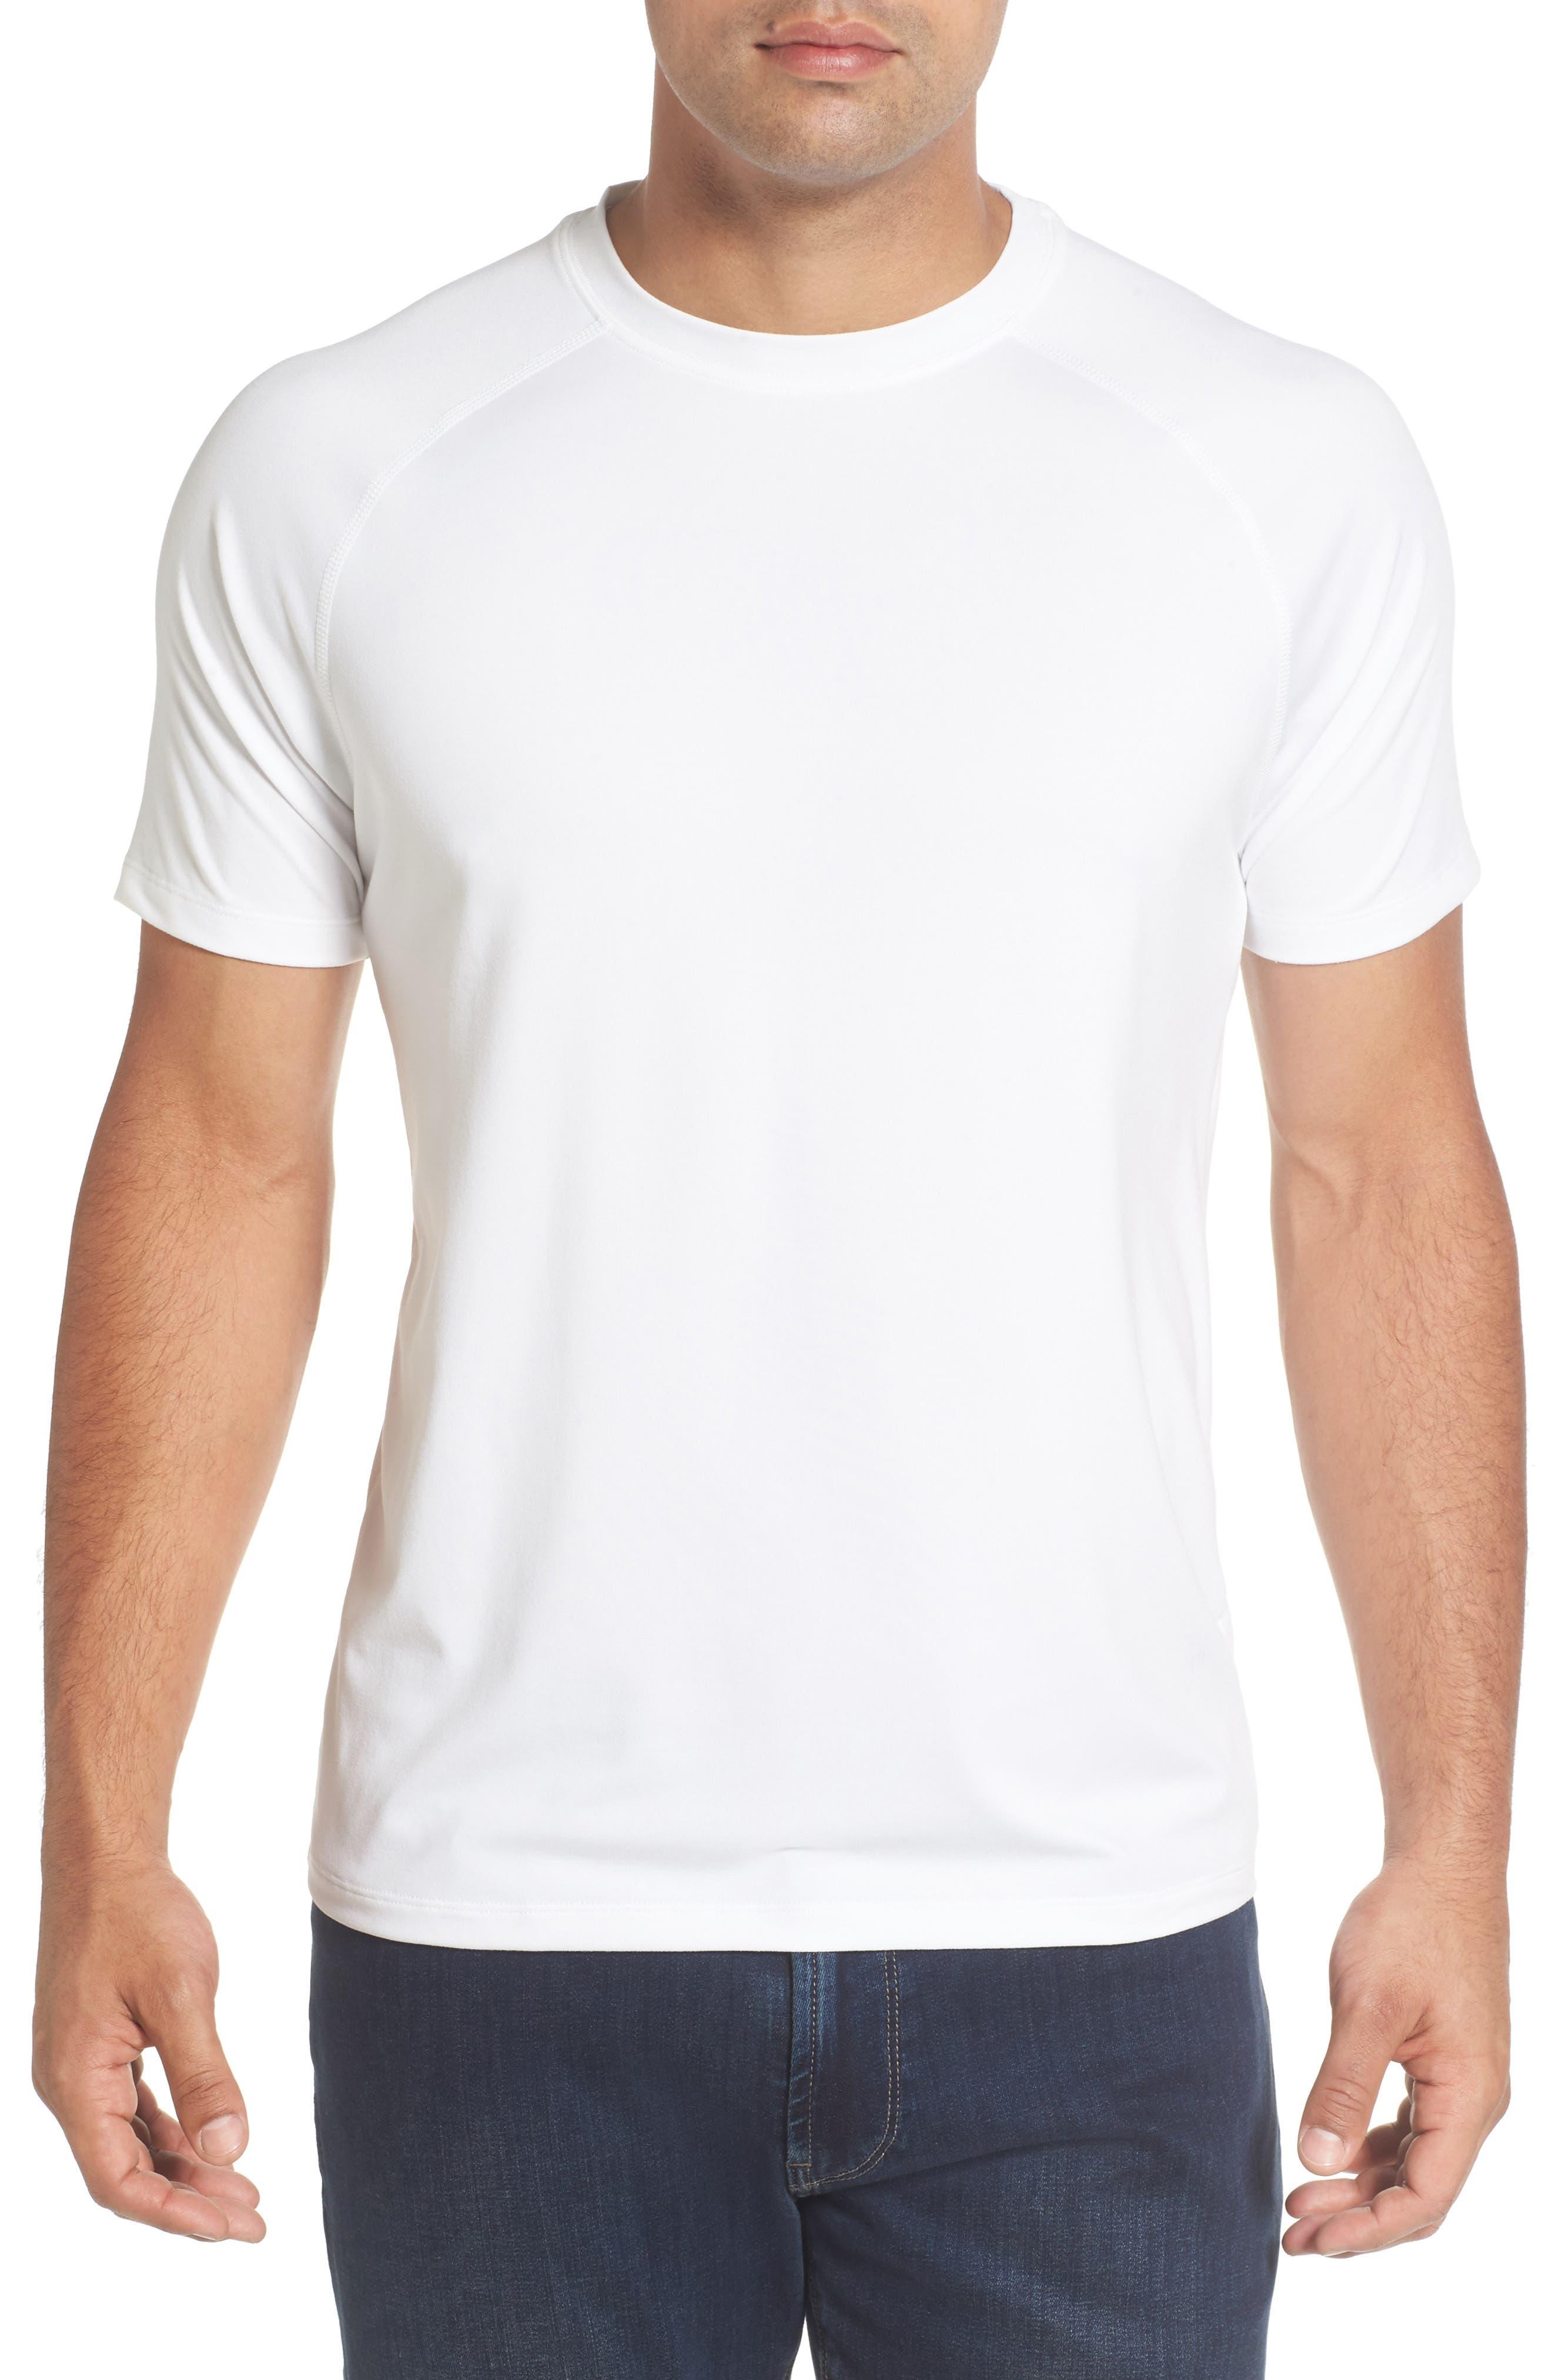 Rio Technical T-Shirt,                         Main,                         color, White